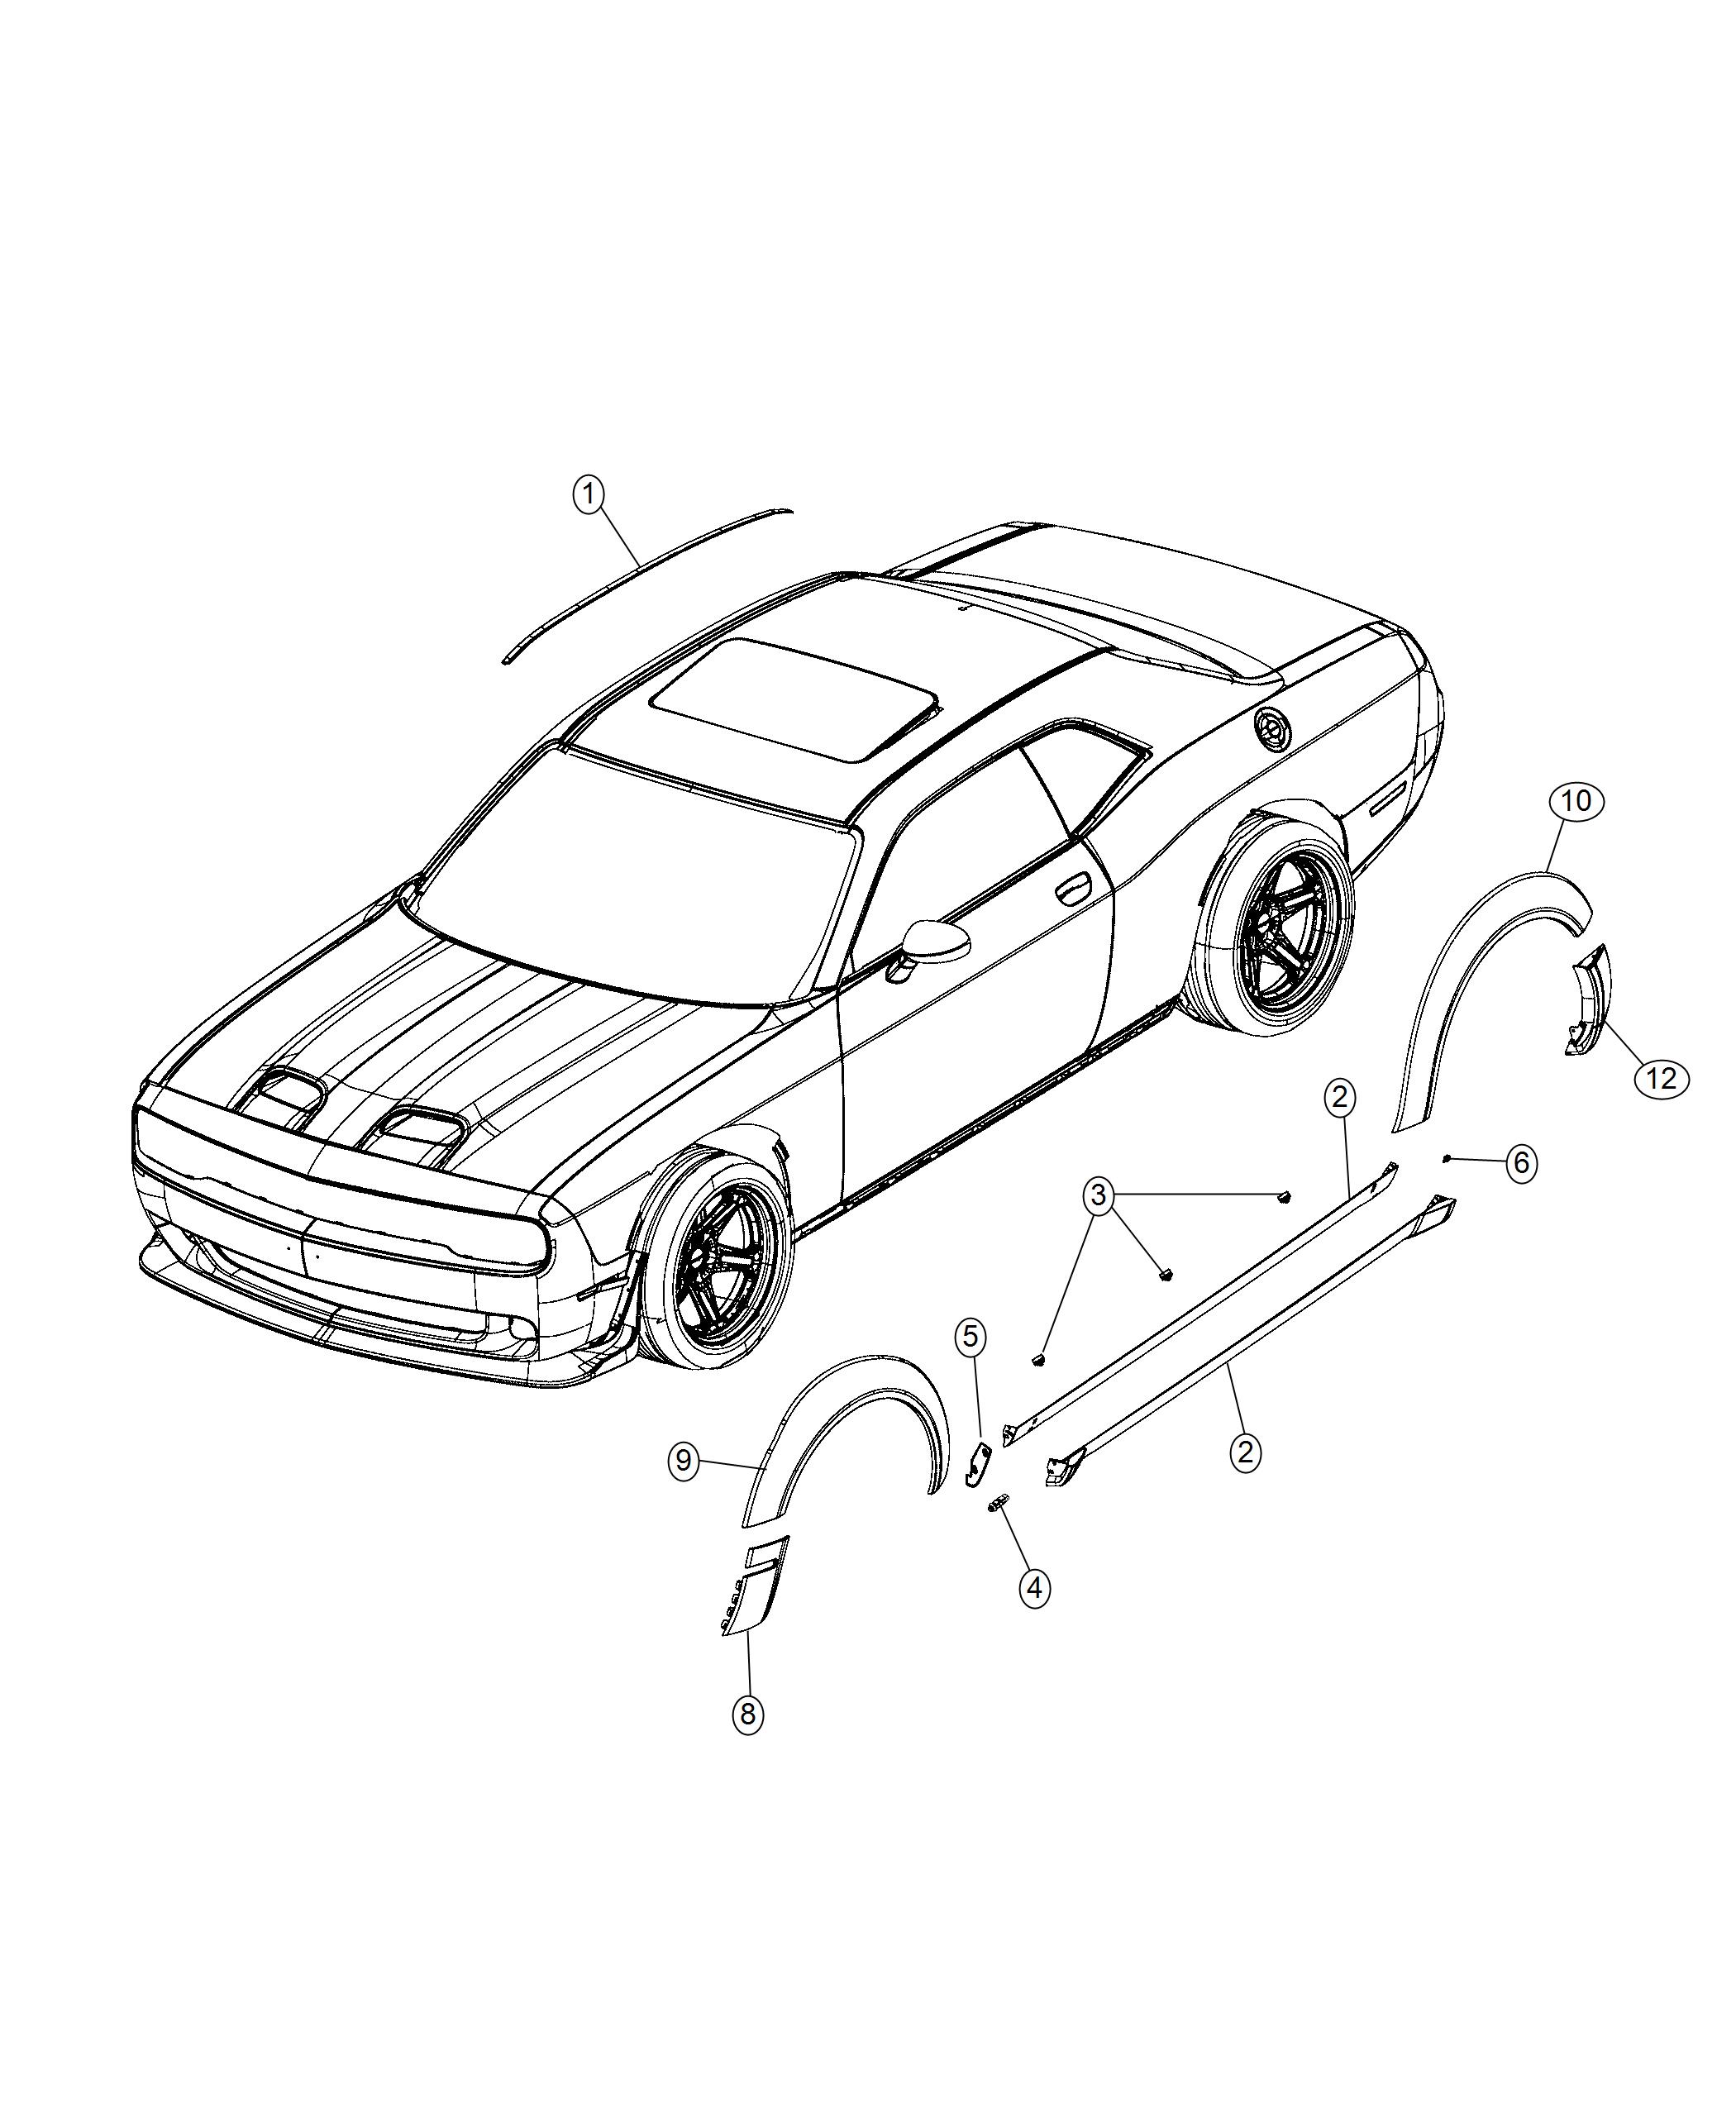 2019 Dodge Challenger Molding. Wheel opening flare. Rear